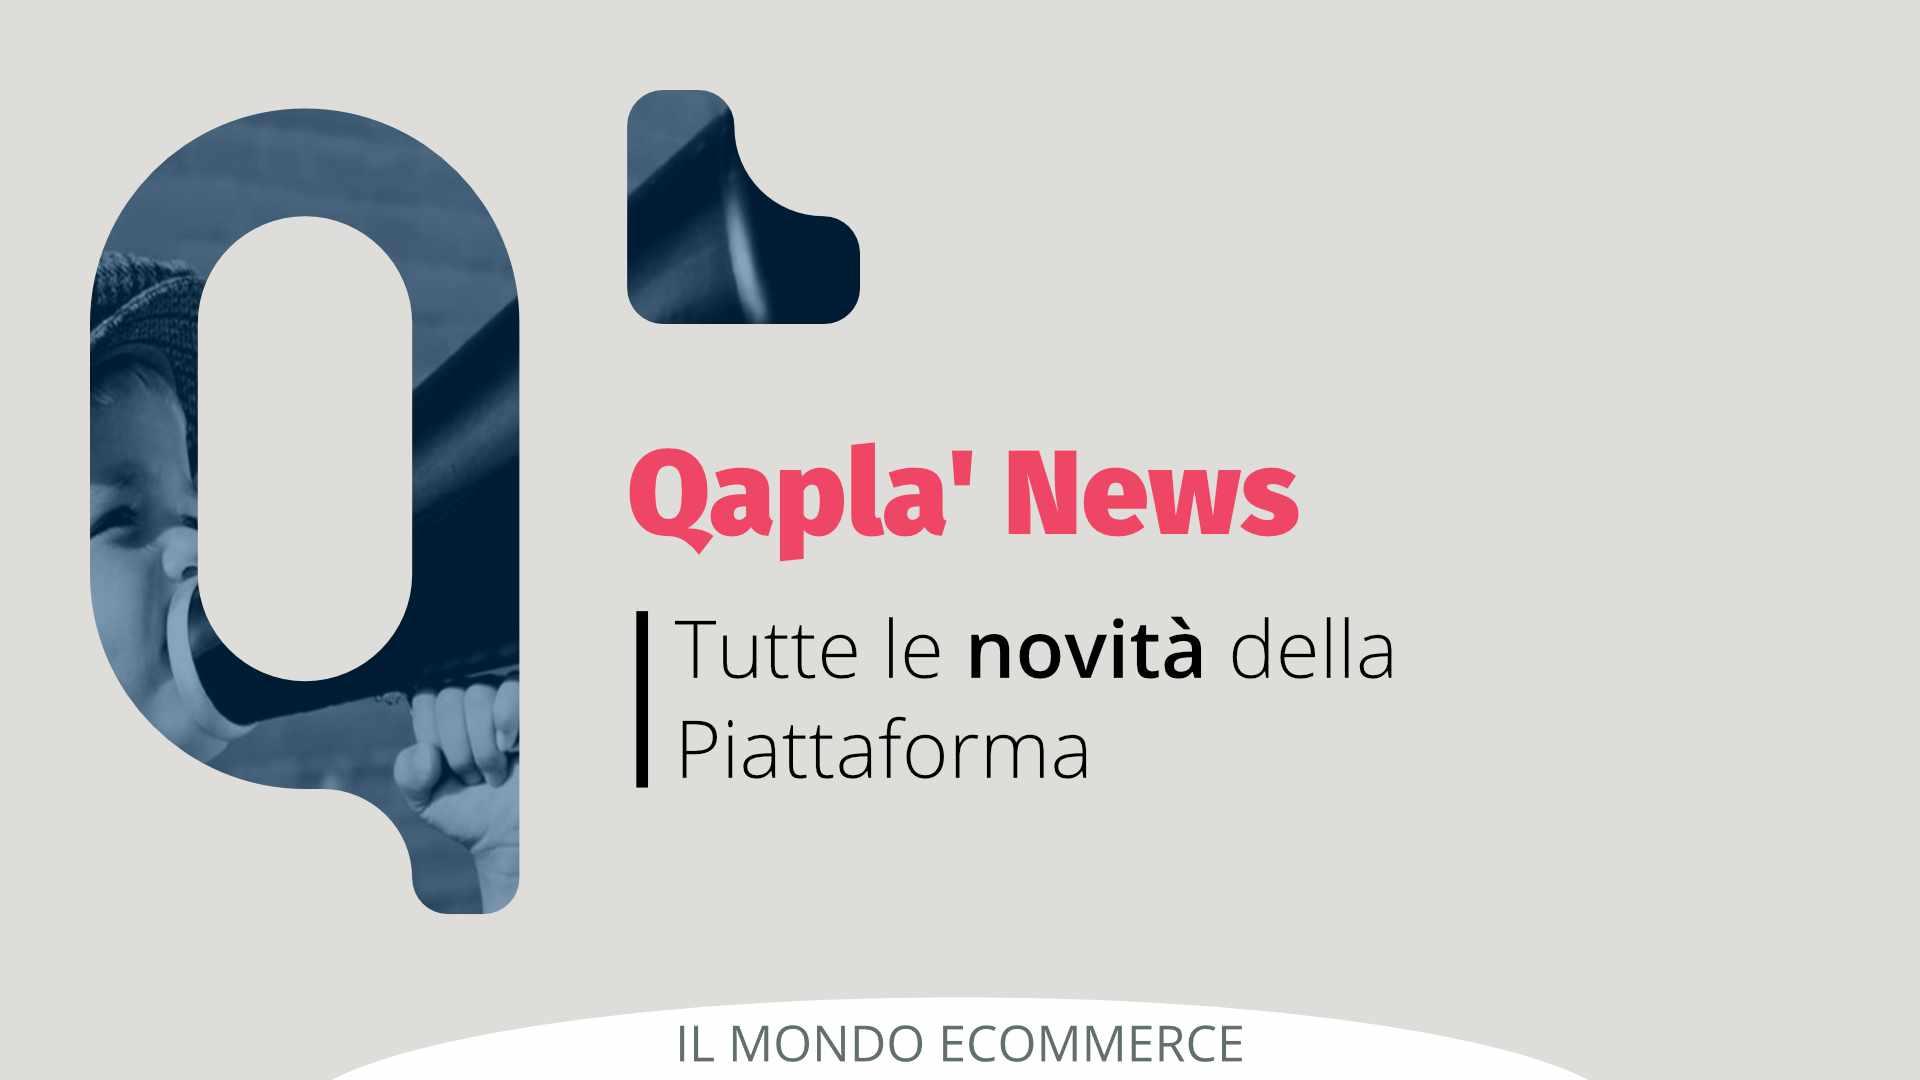 Qapla' news aprile 2019